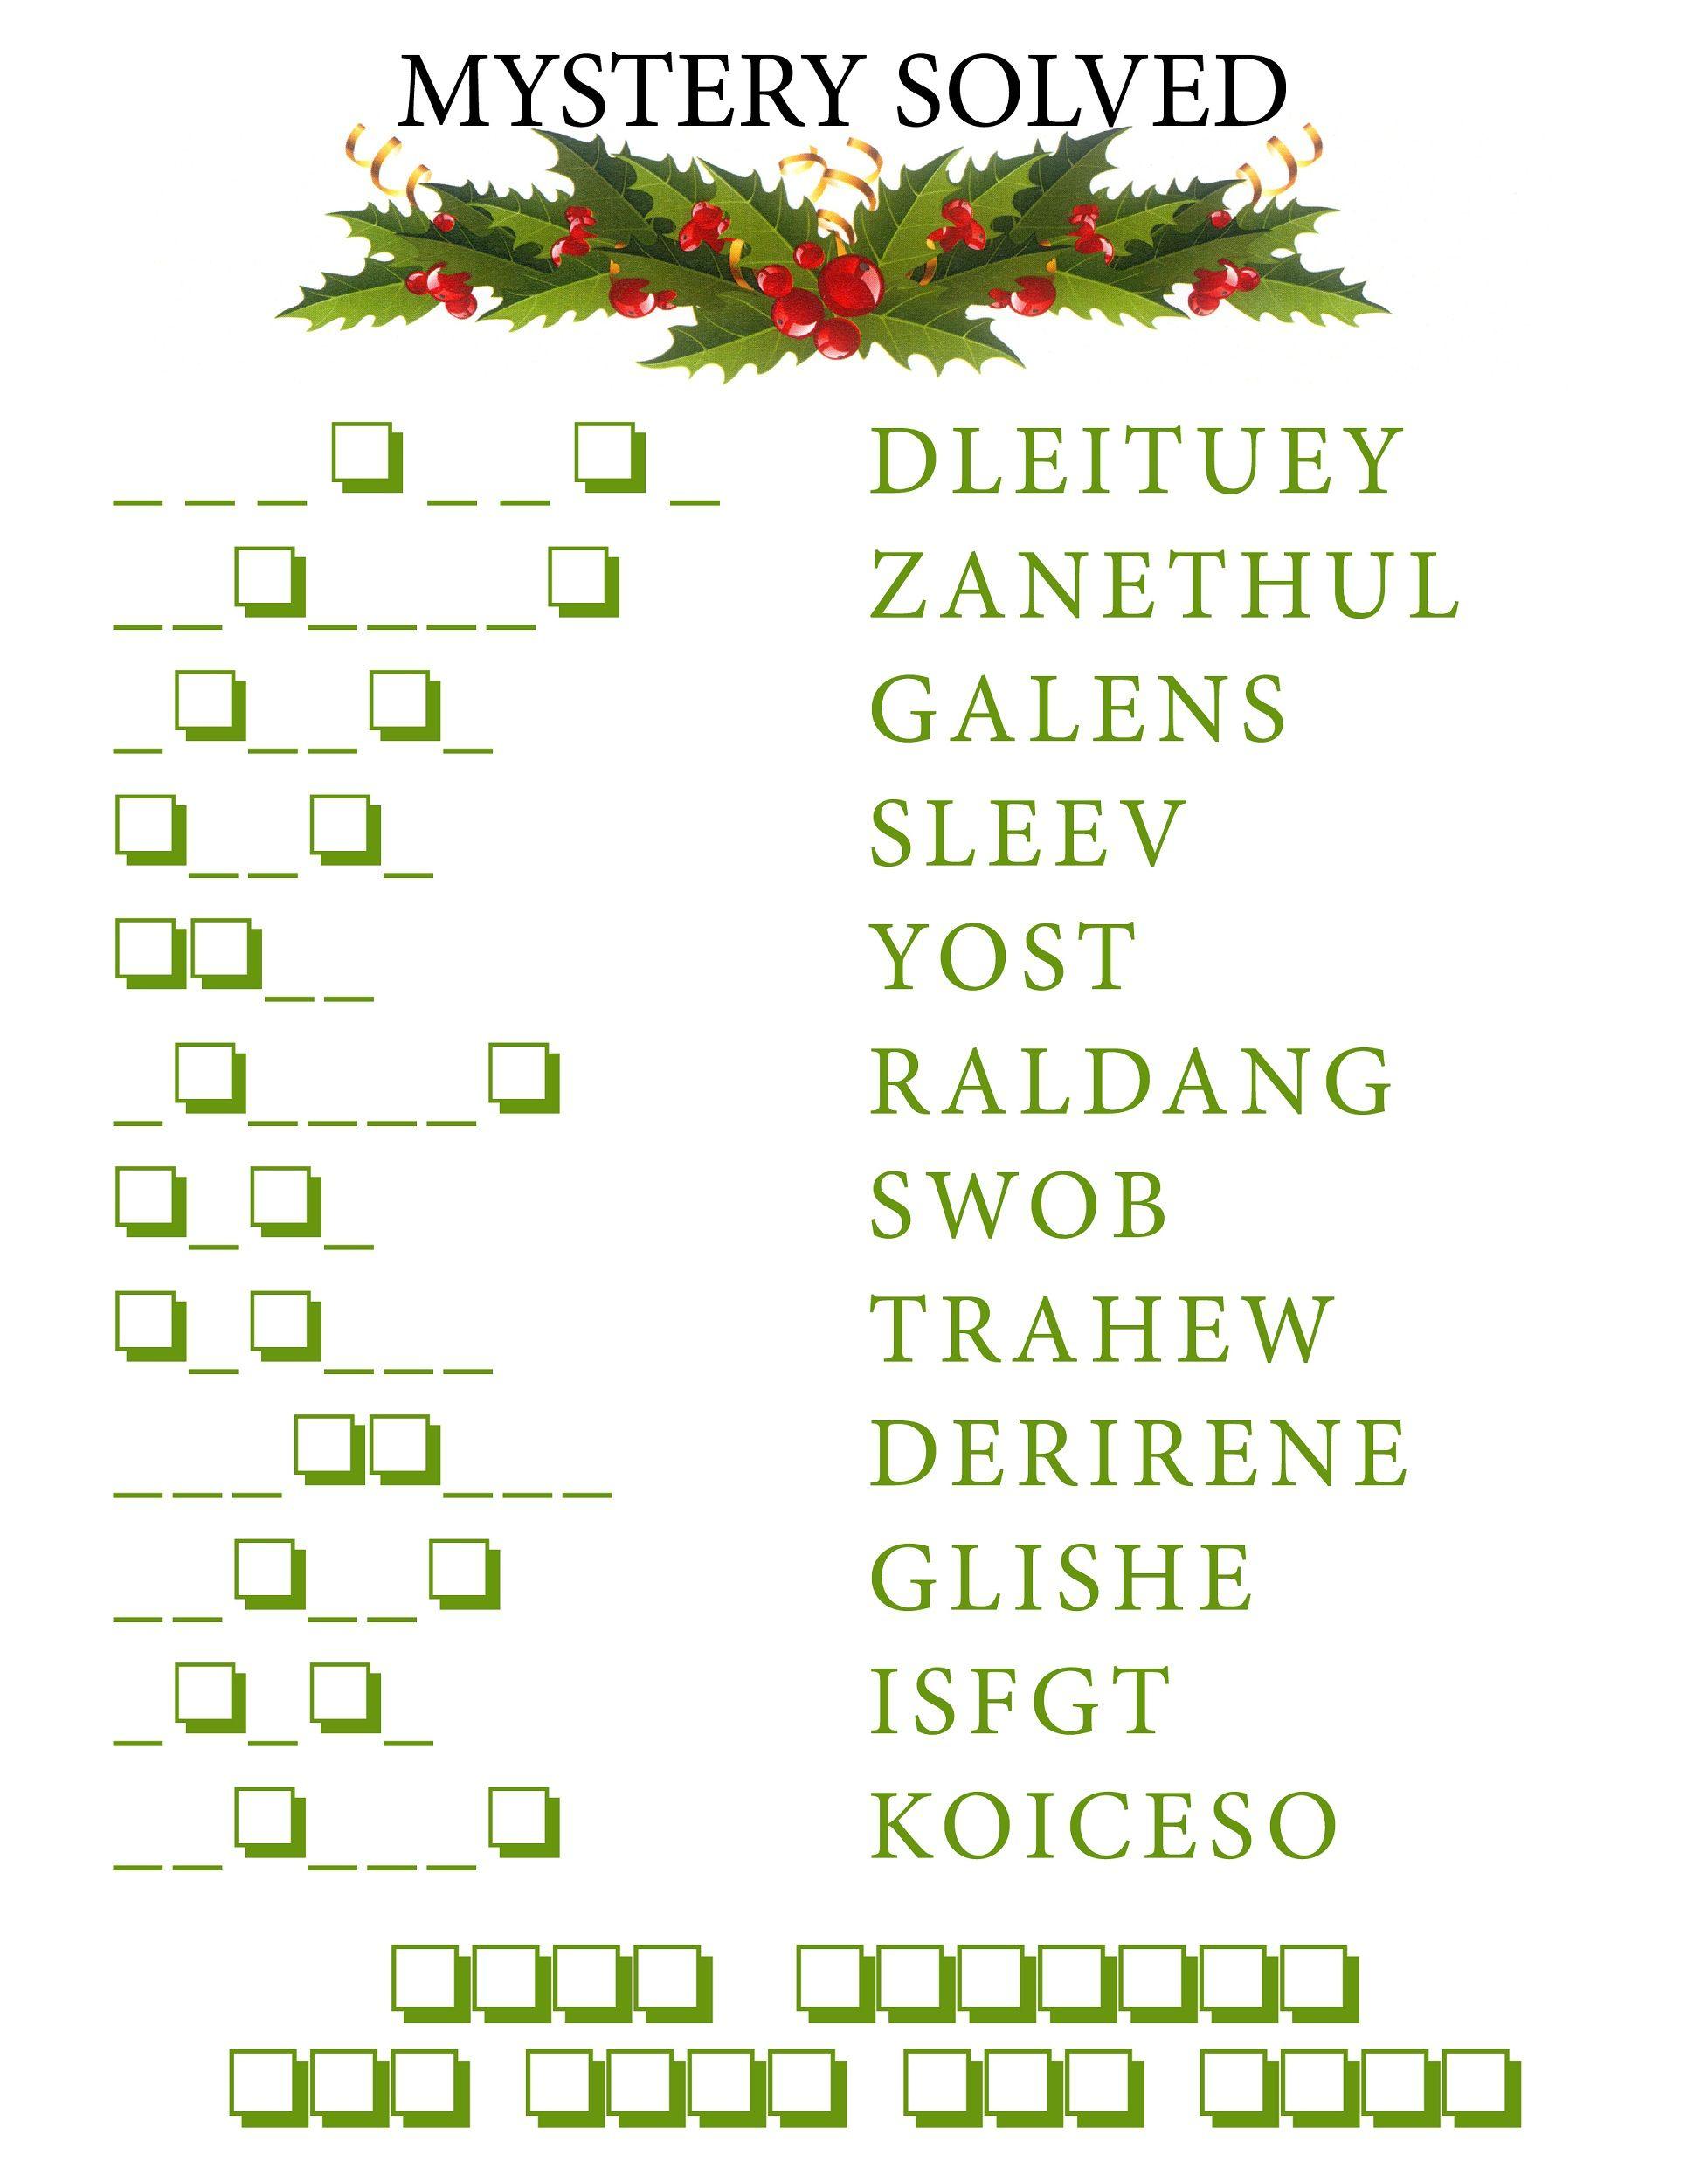 Word Scramble Puzzles Christmas   K5 Worksheets   Christmas Activity - Free Word Scramble Maker Printable